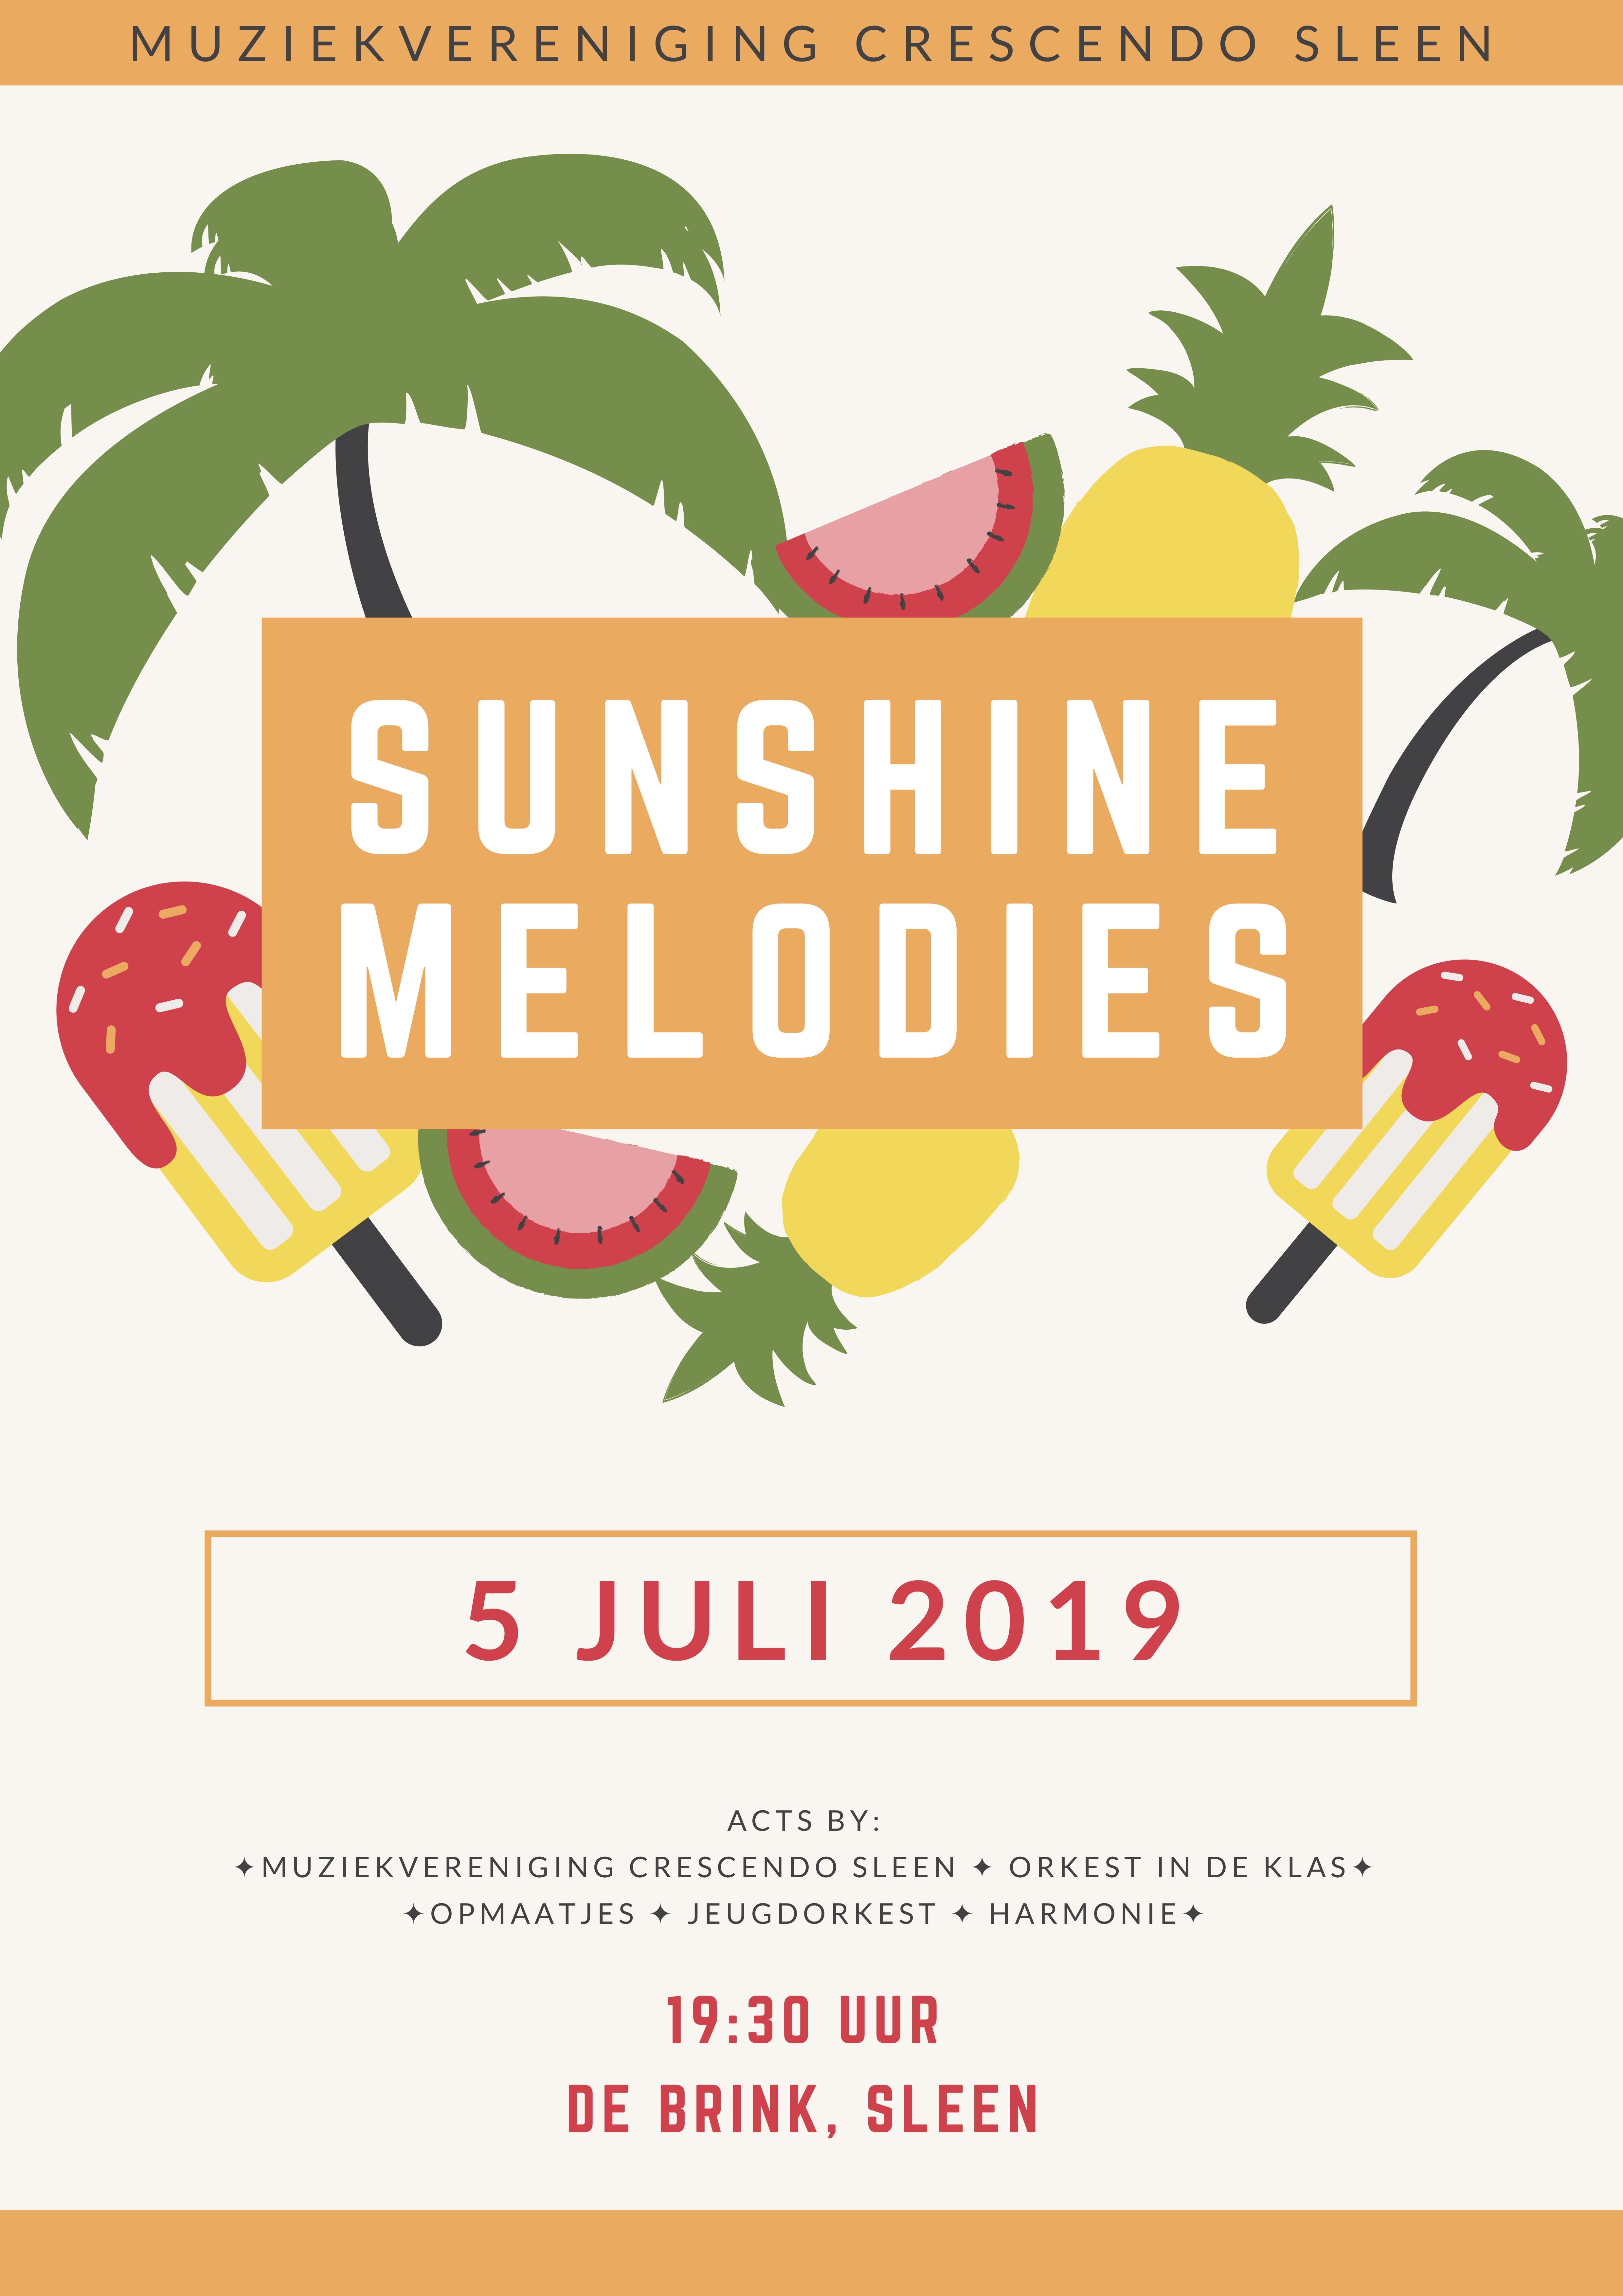 Sunshine melodies poster